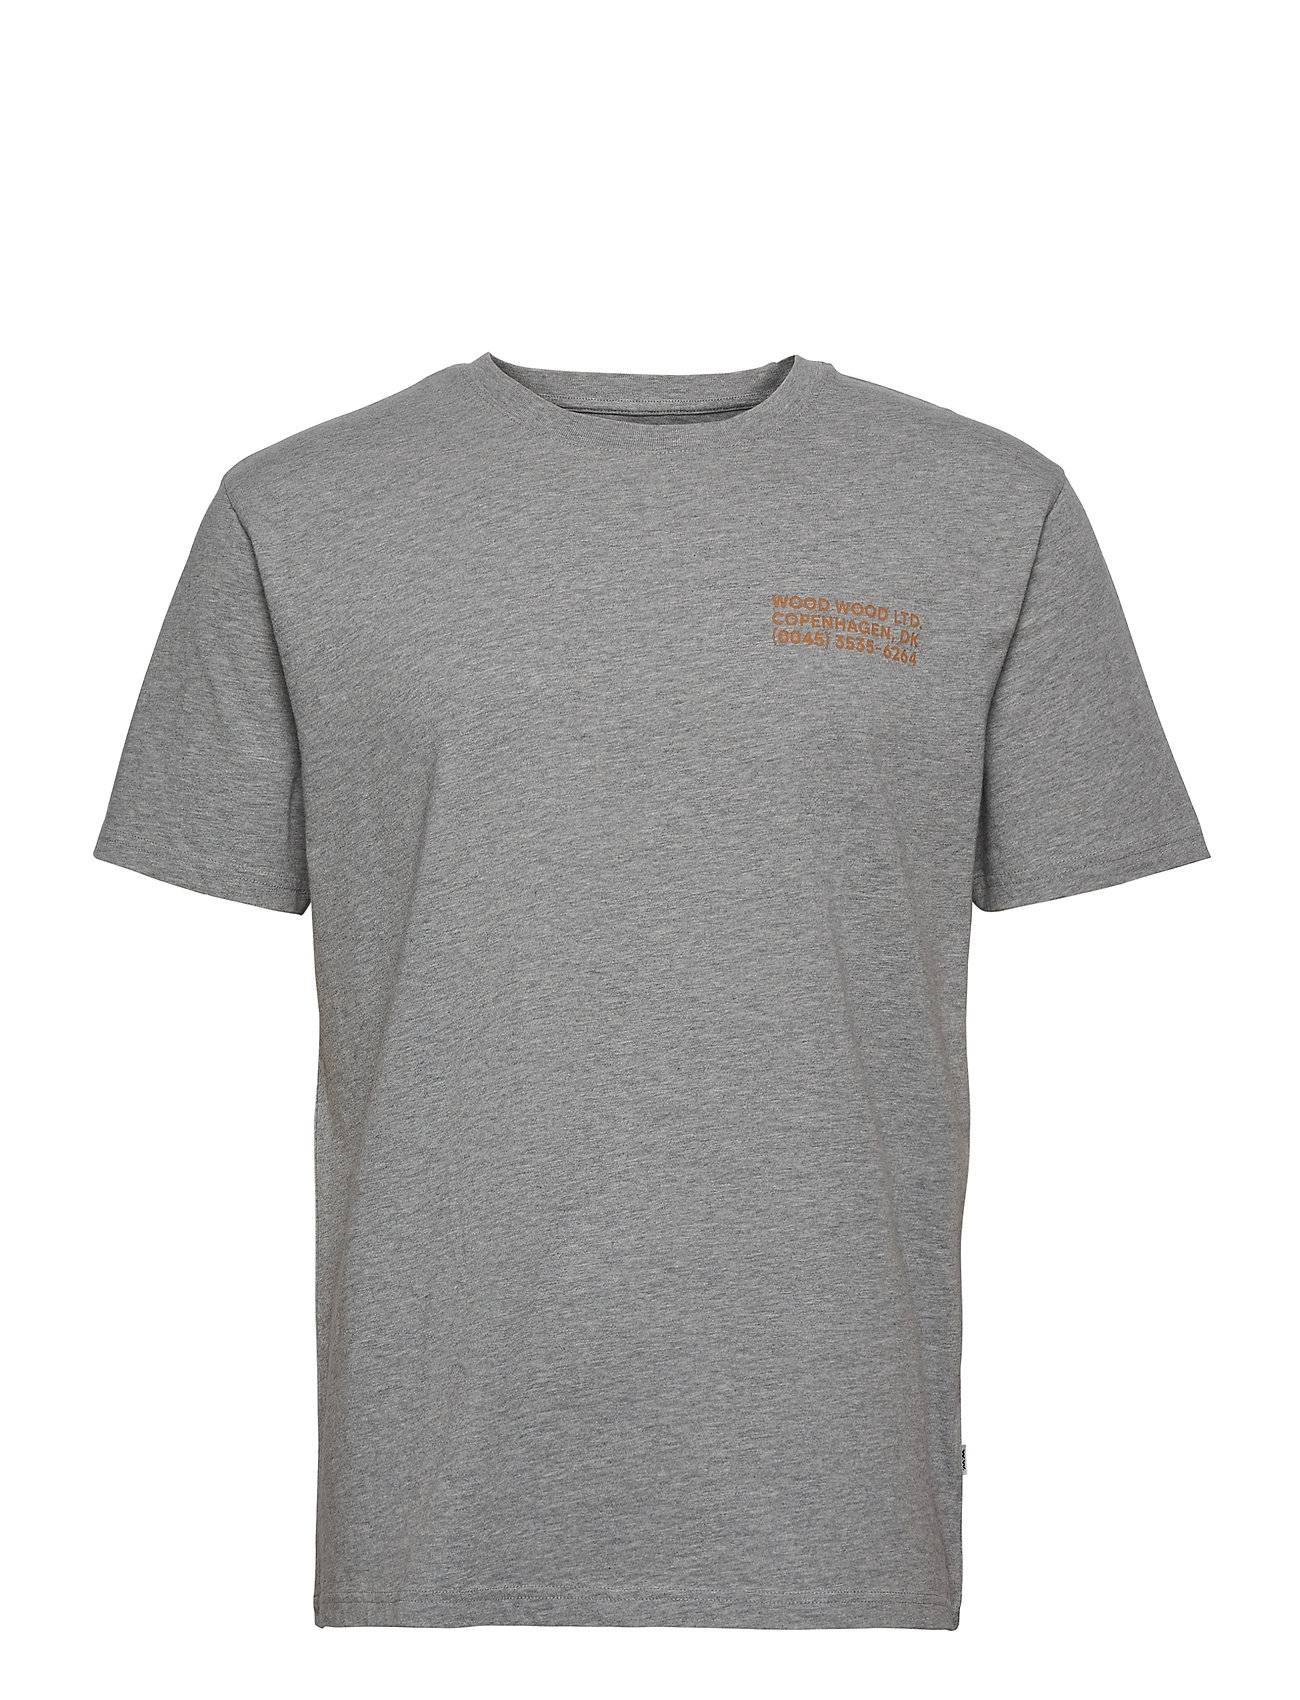 Wood Wood Info T-Shirt T-shirts Short-sleeved Grå Wood Wood